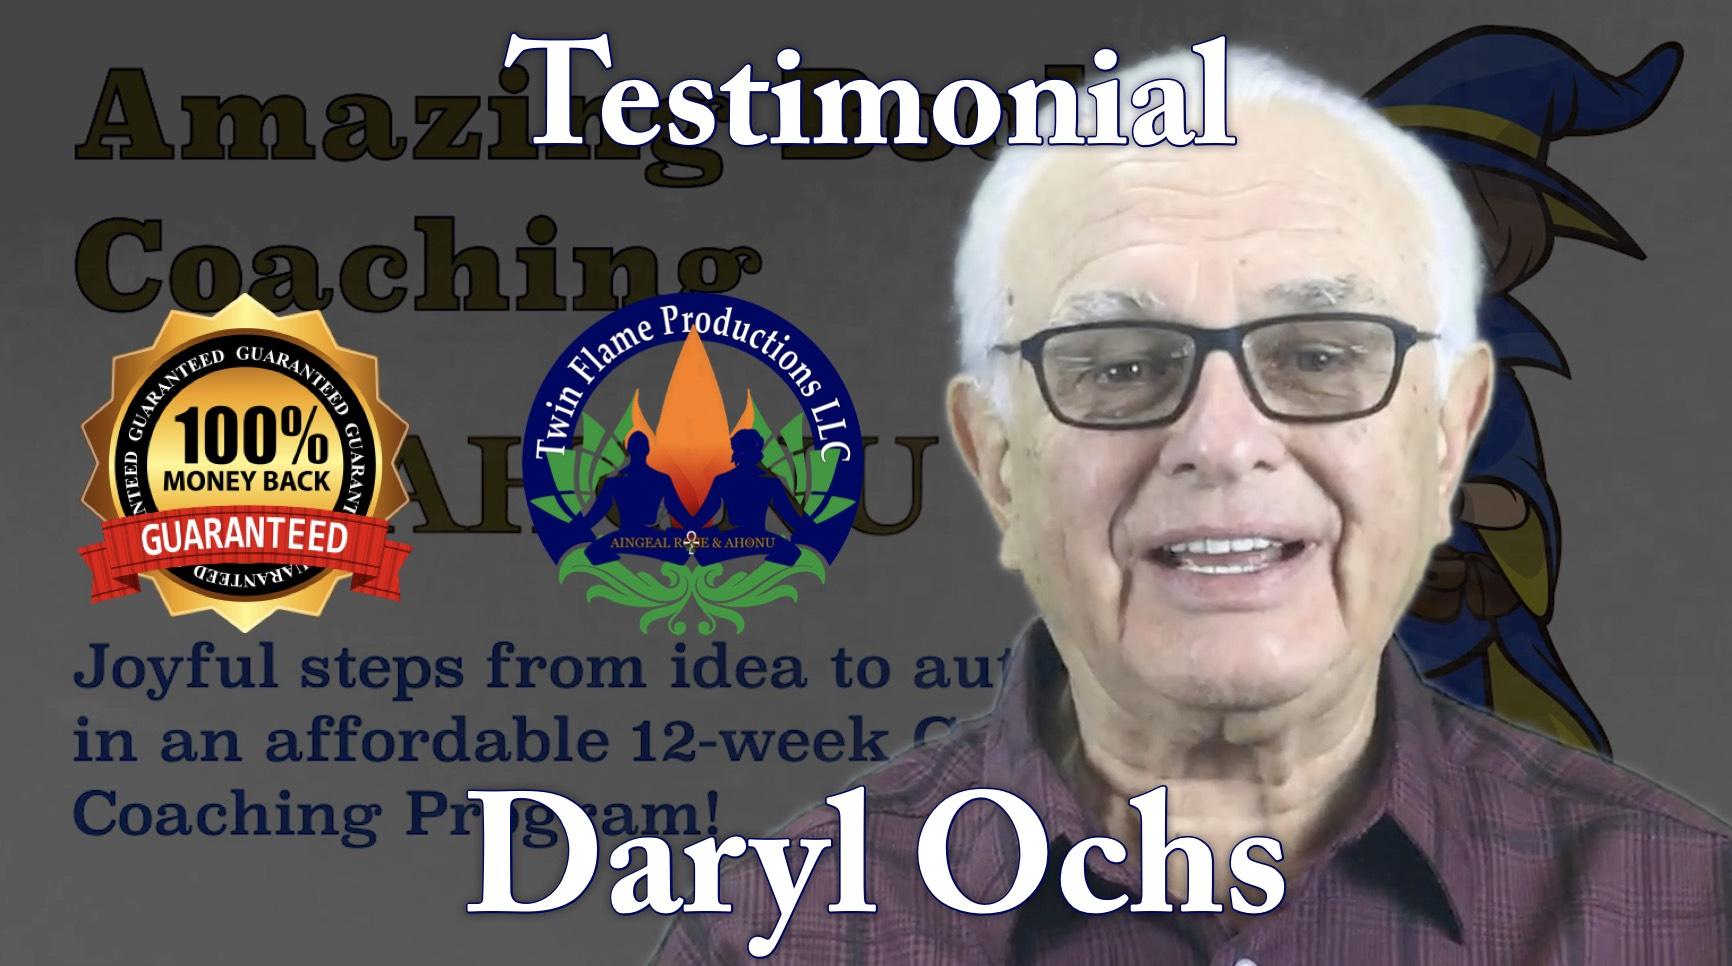 Testimonial from Daryl Ochs